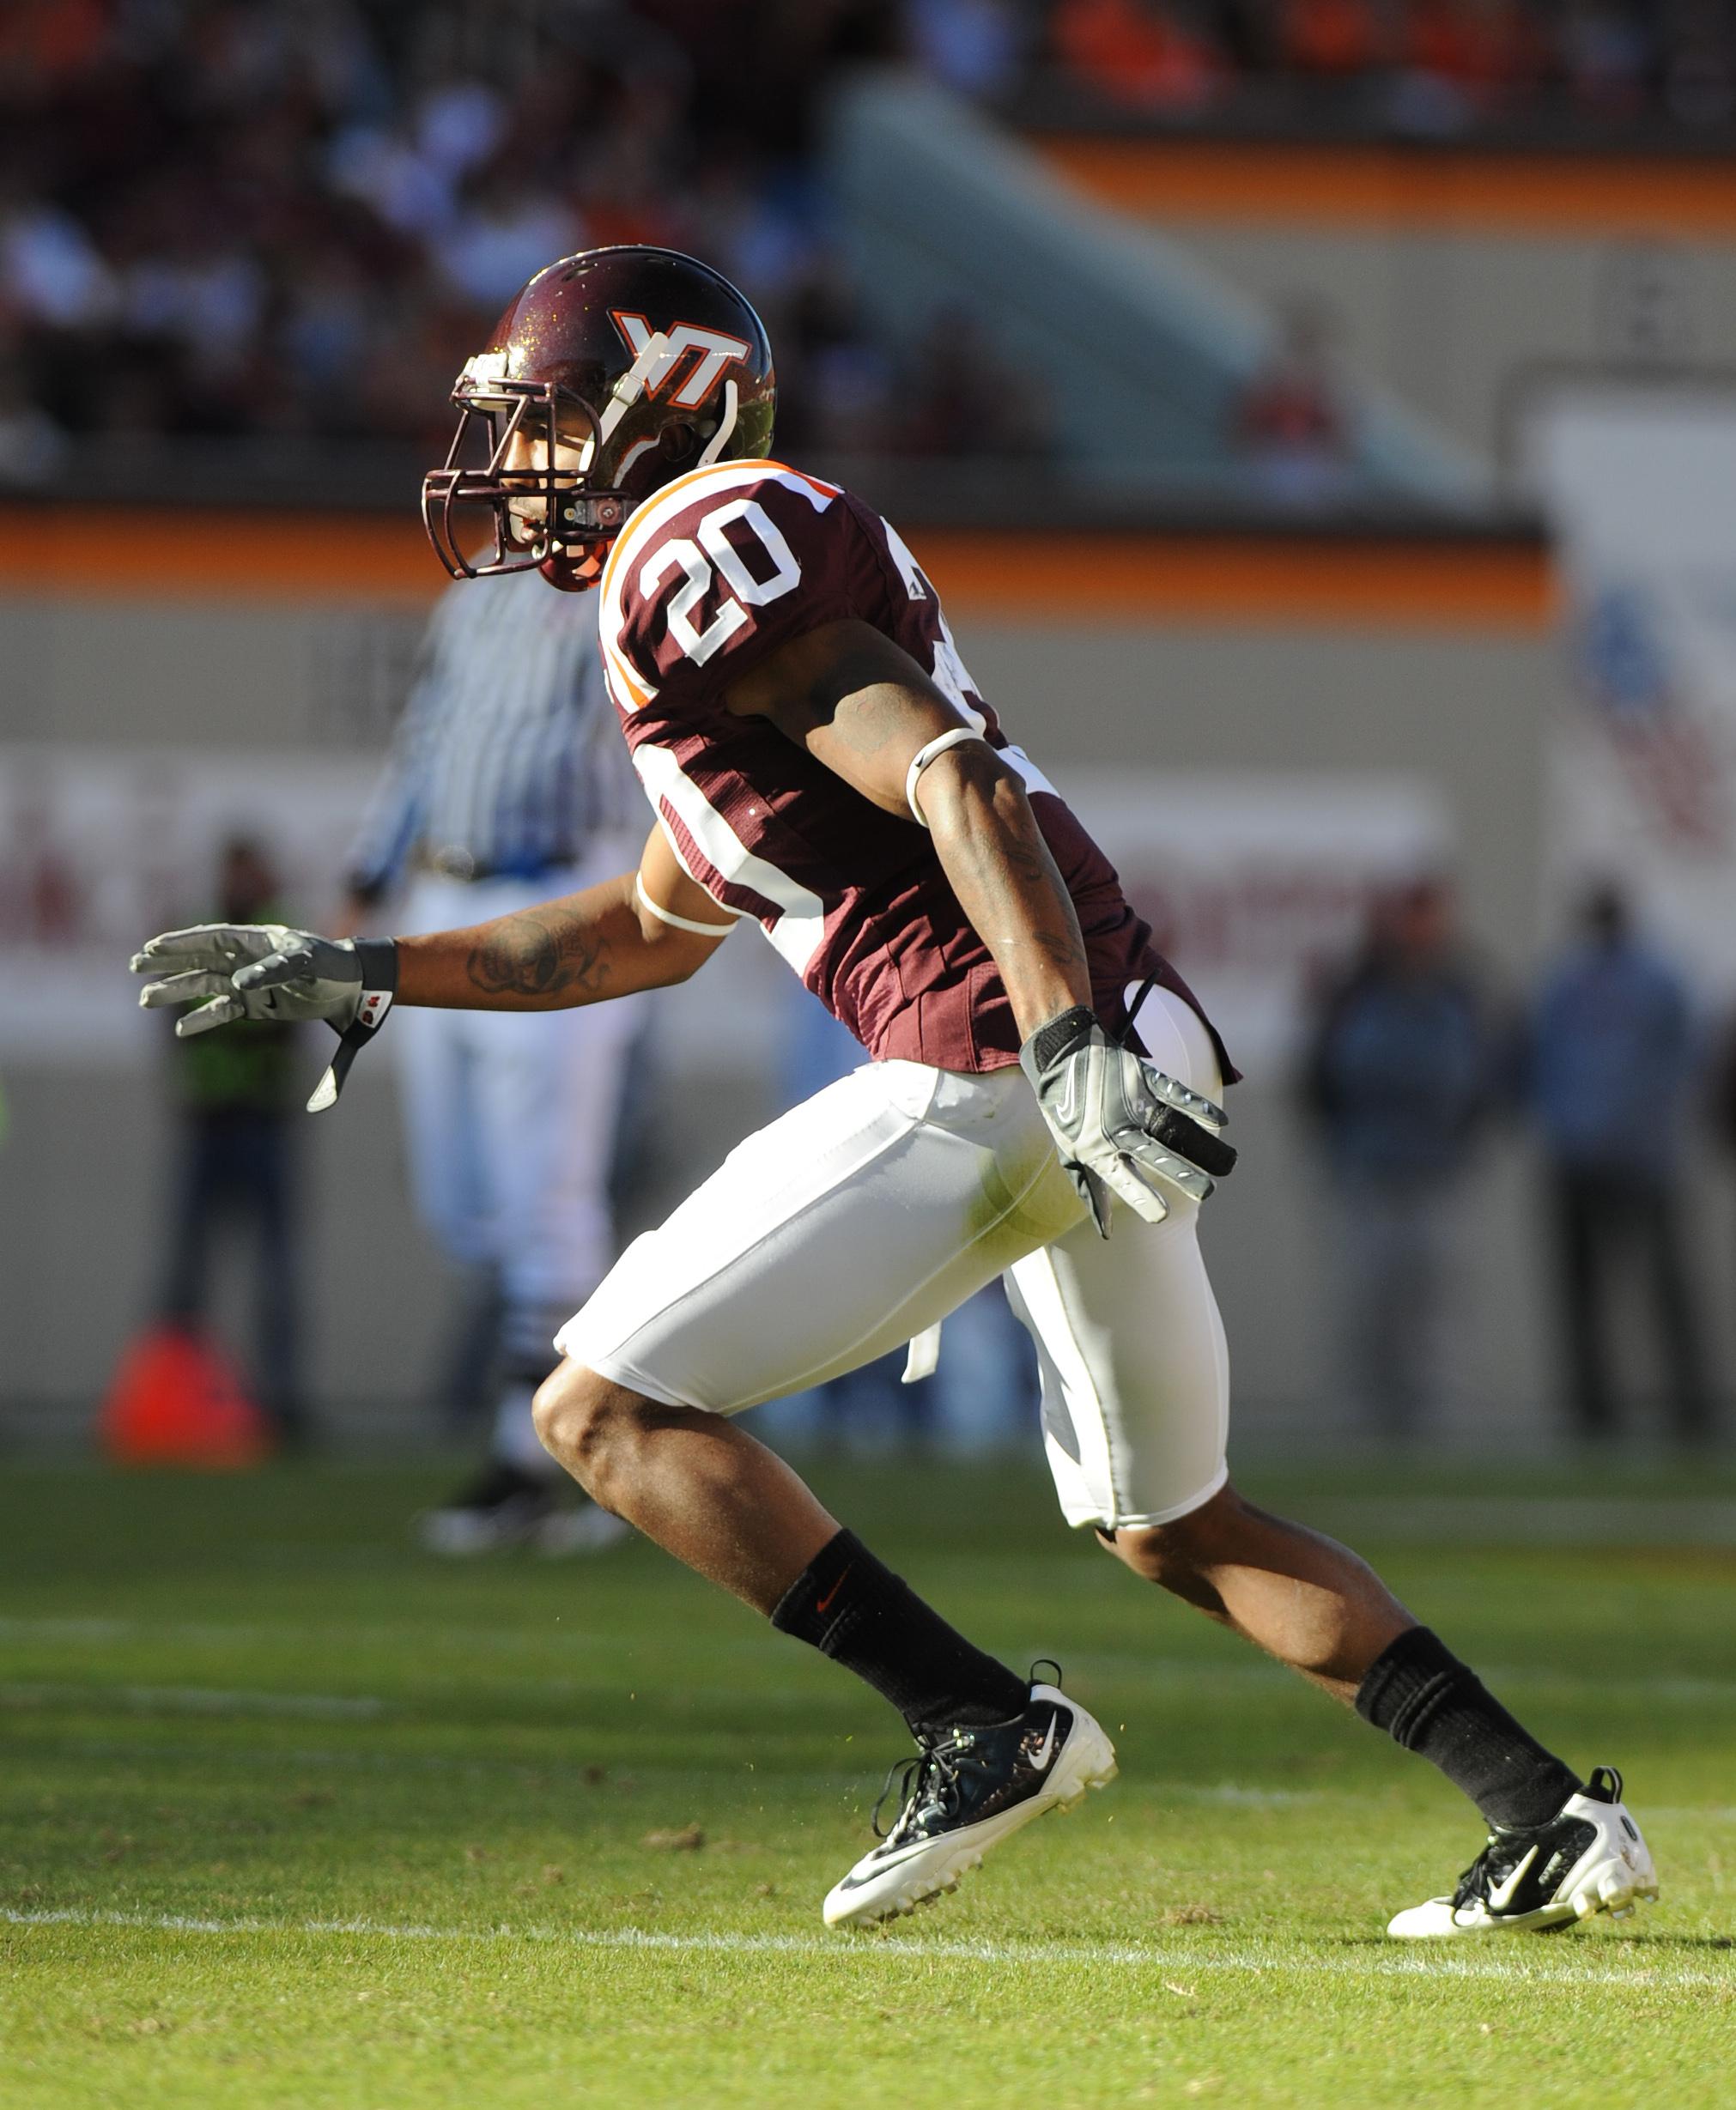 Building the Perfect NFL Defensive Back | Bleacher Report